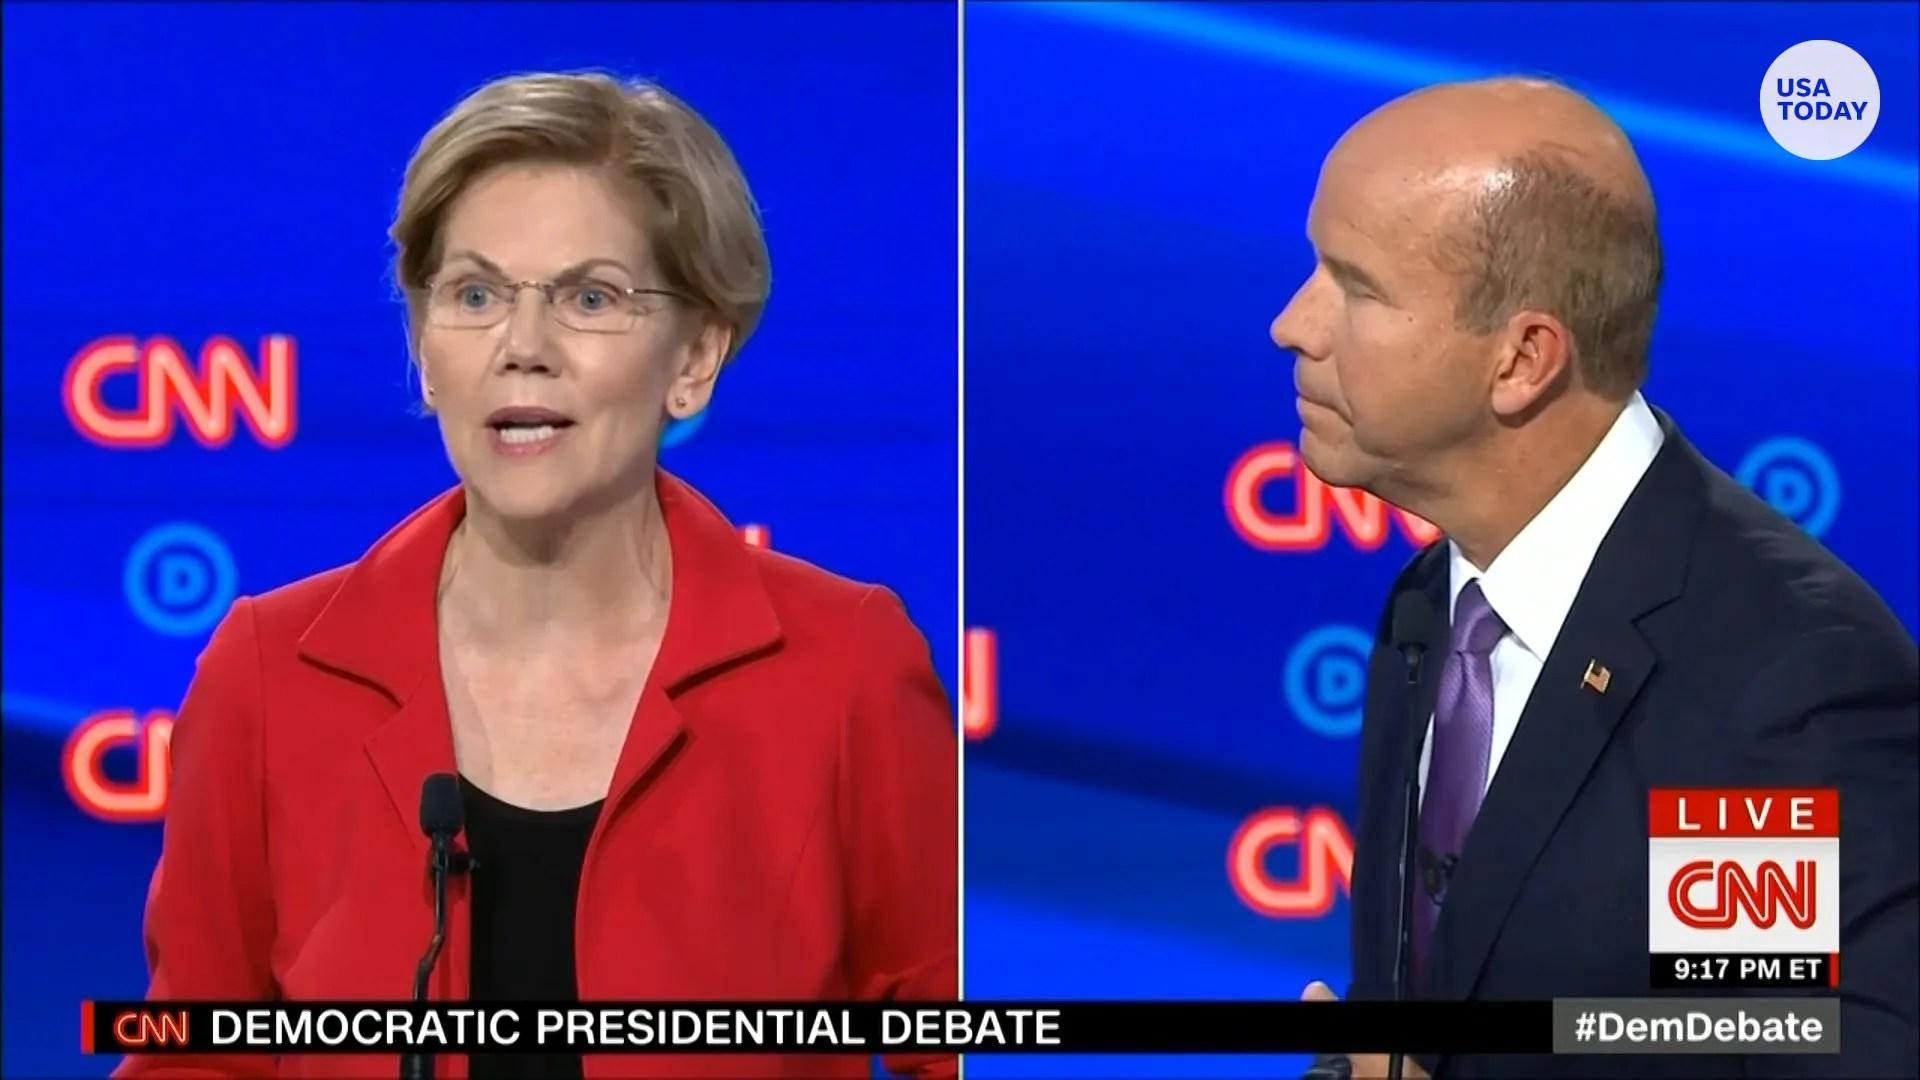 democratic debate winners are